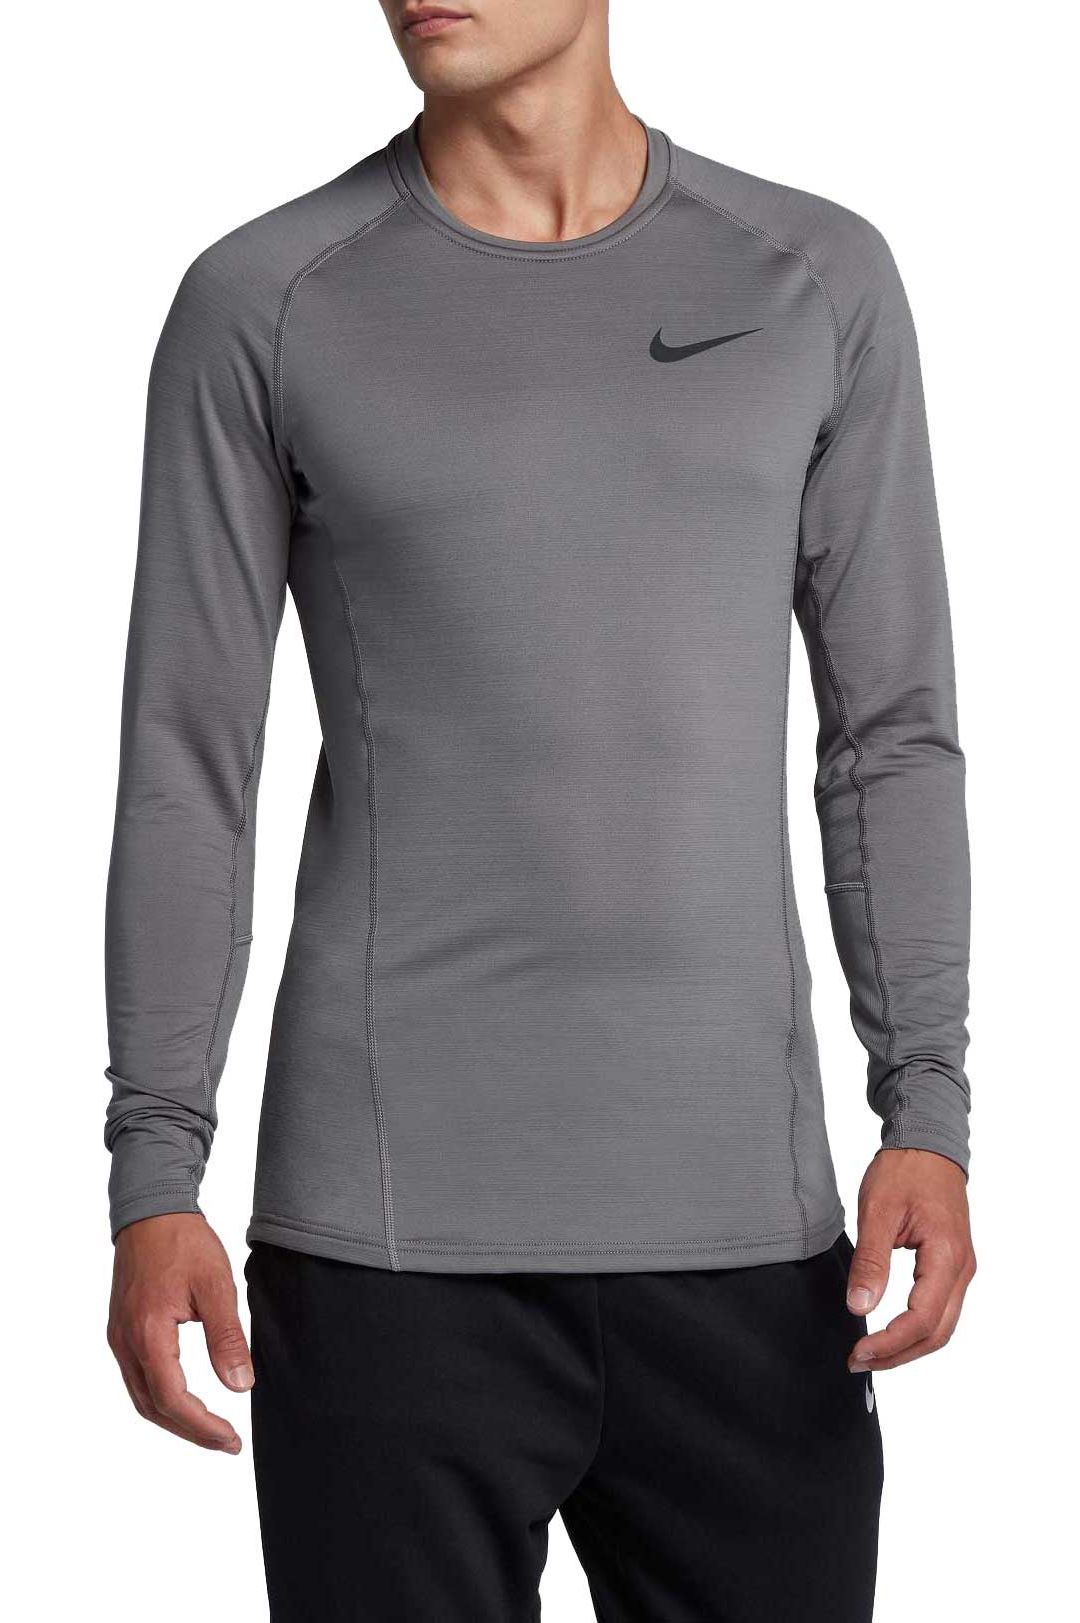 a78bc2e77a3f4 Nike Men's Pro Therma Dri-FIT Long Sleeve Shirt. noImageFound. Previous